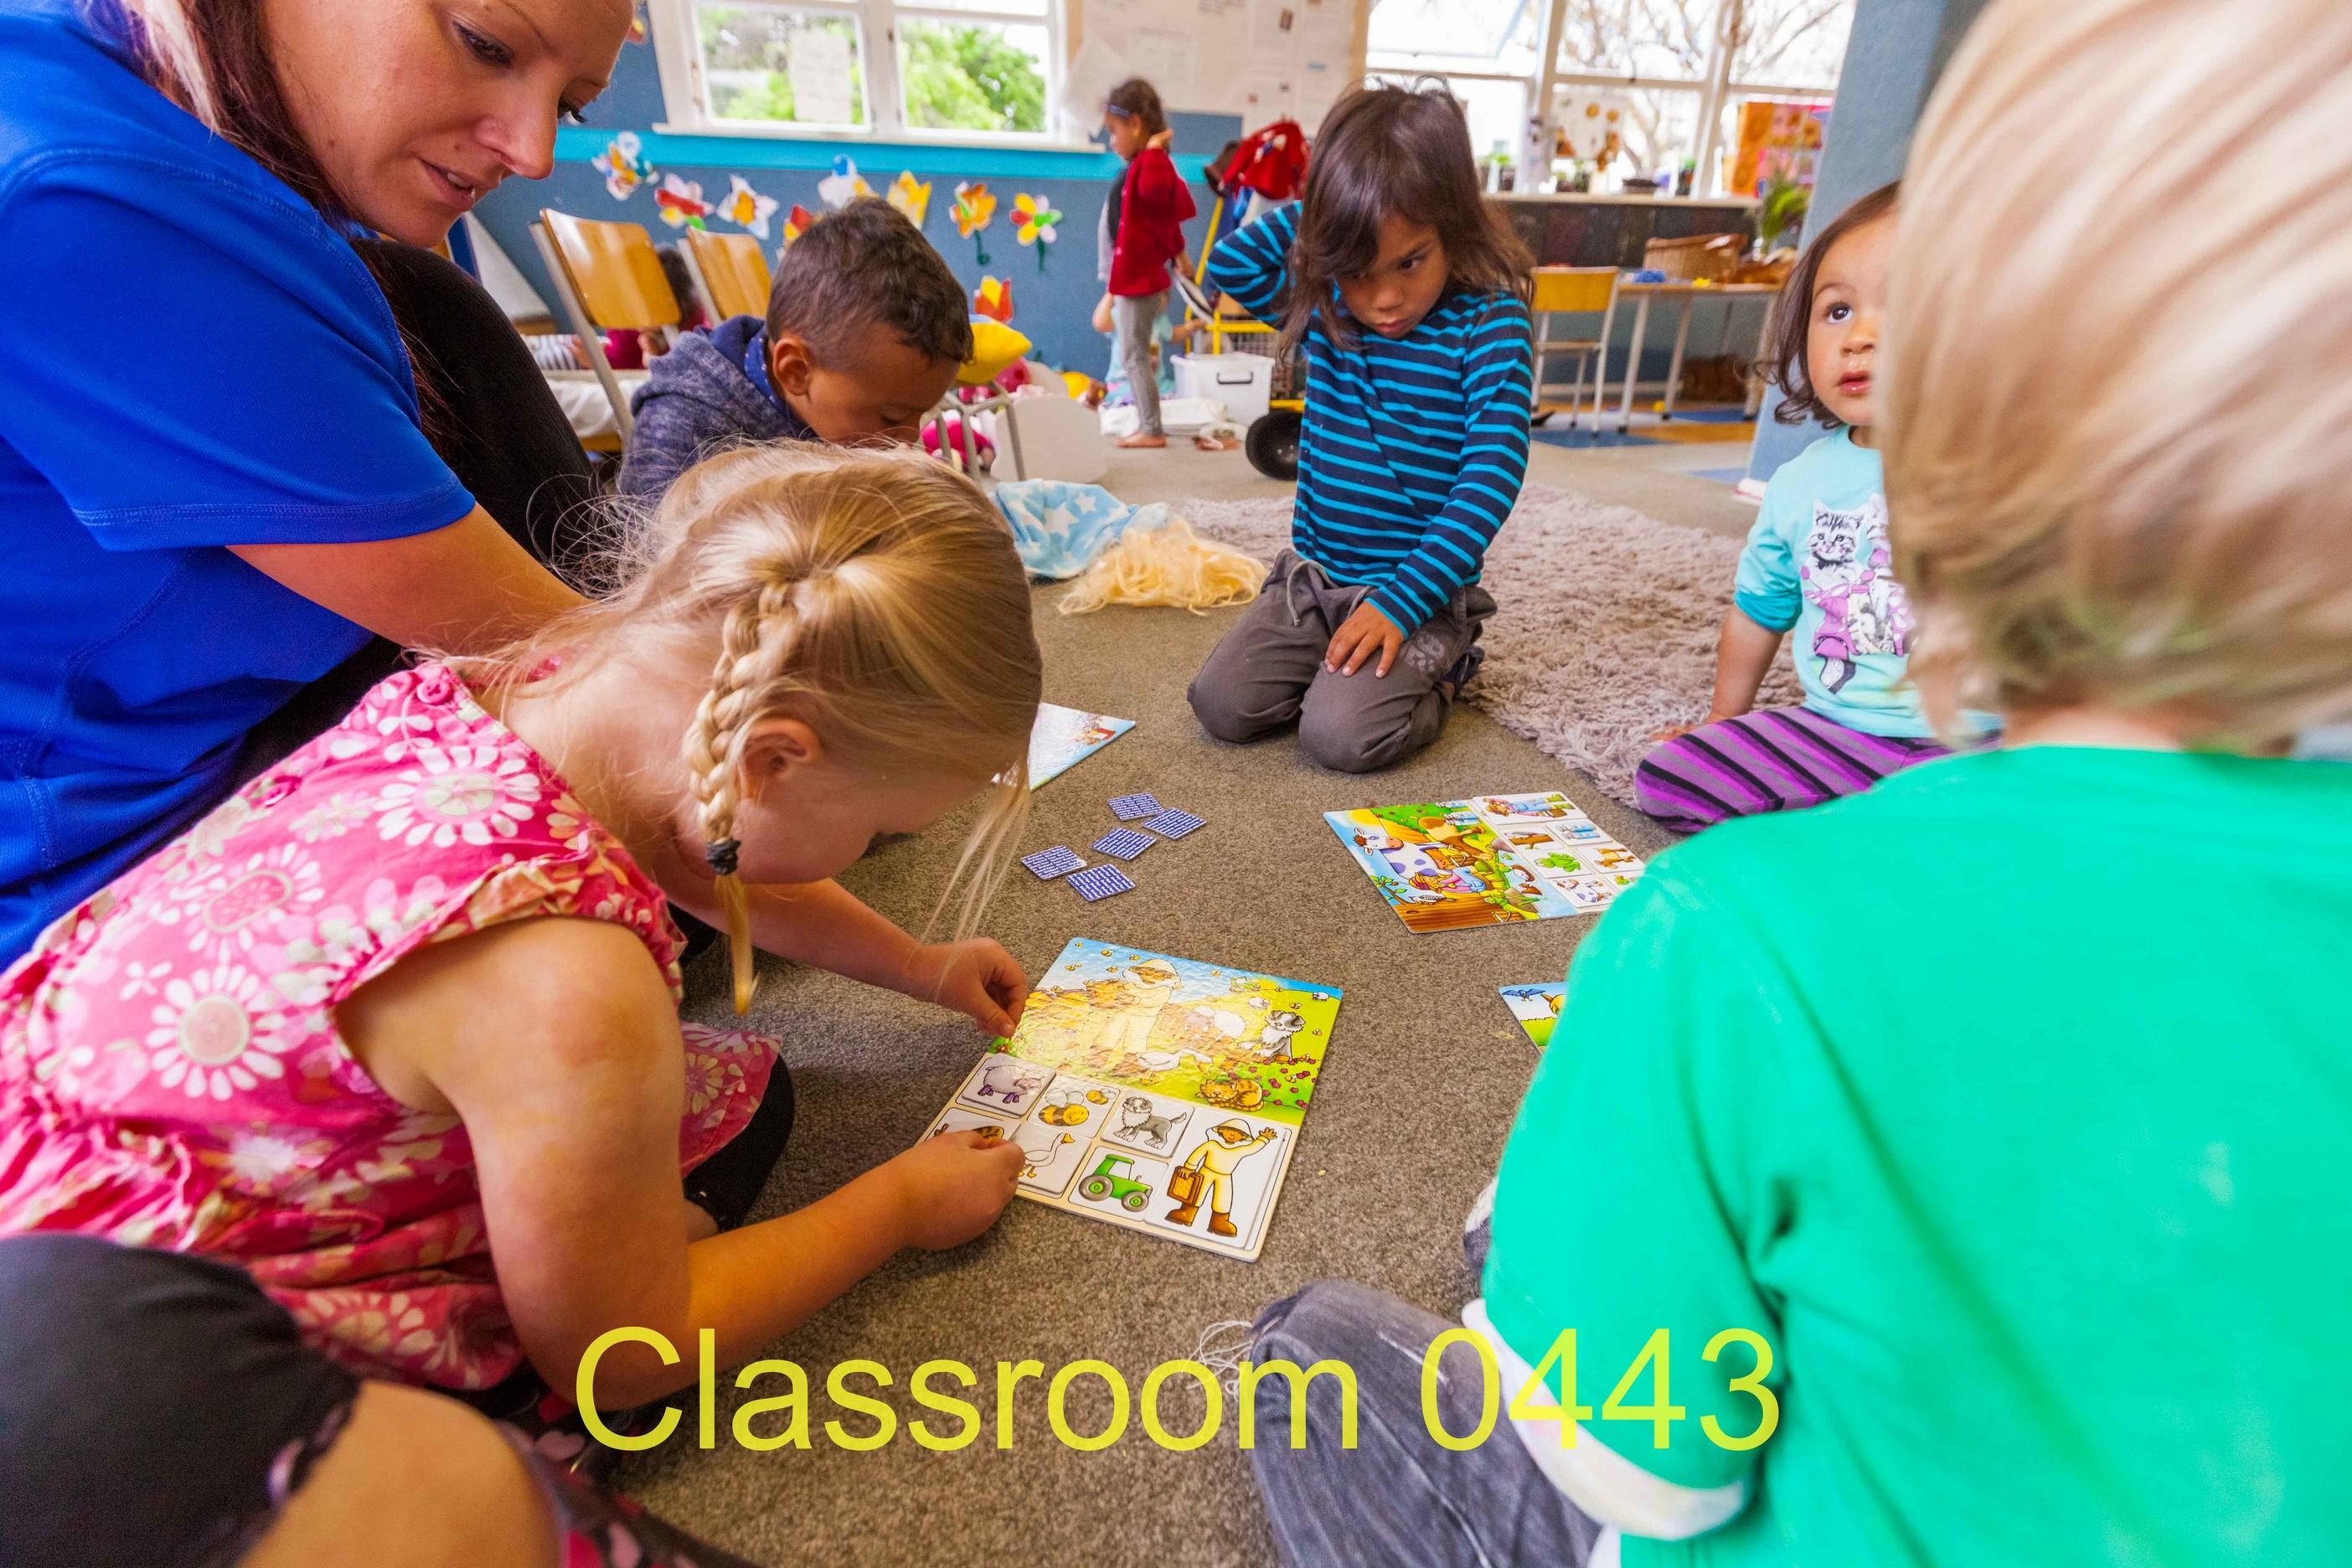 Classroom 0443